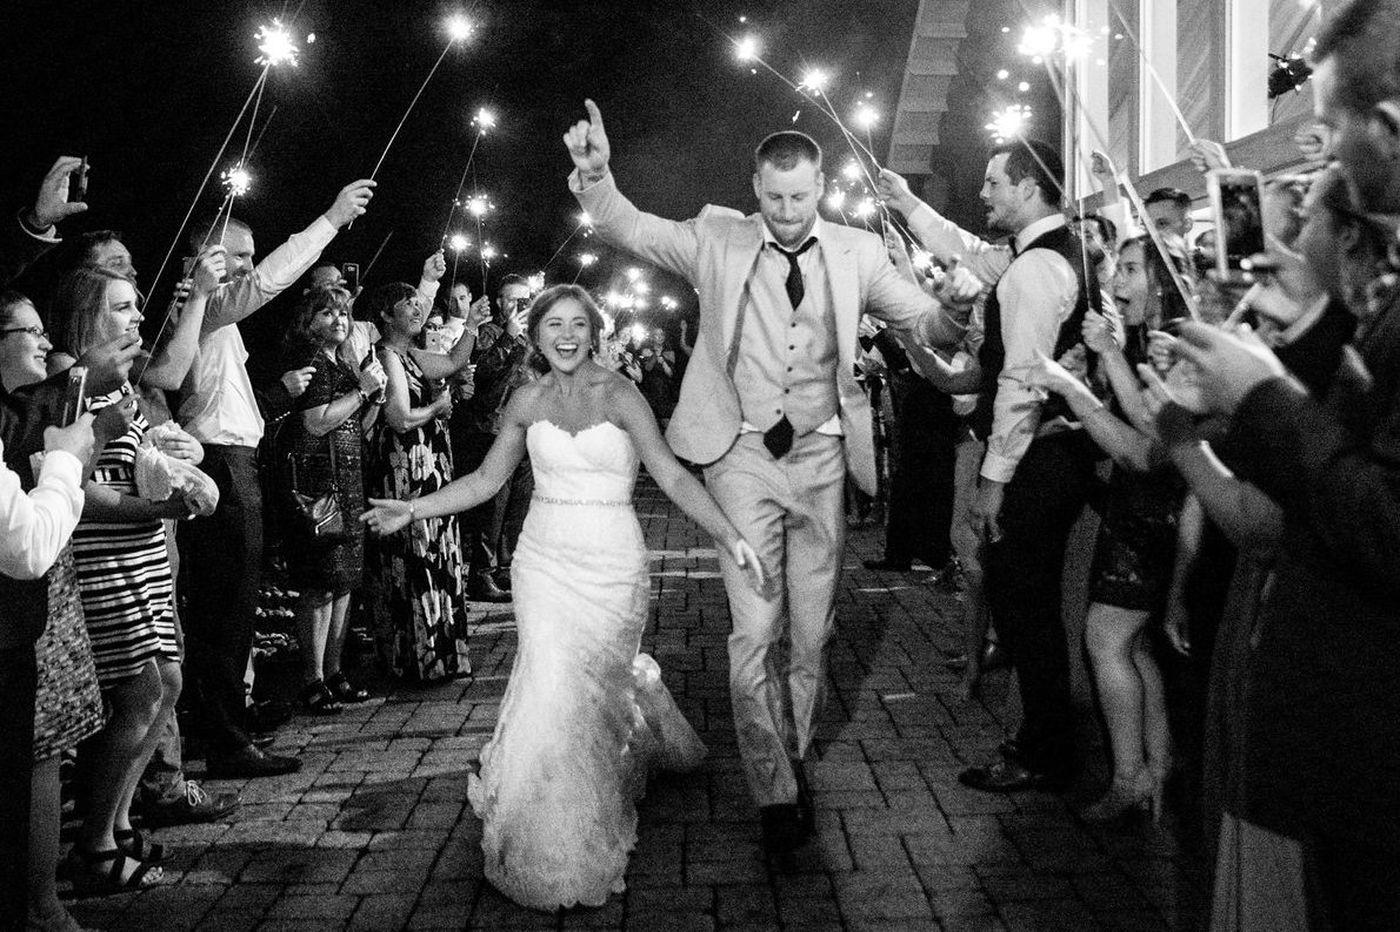 Carson Wentz got married in Bucks County over the weekend